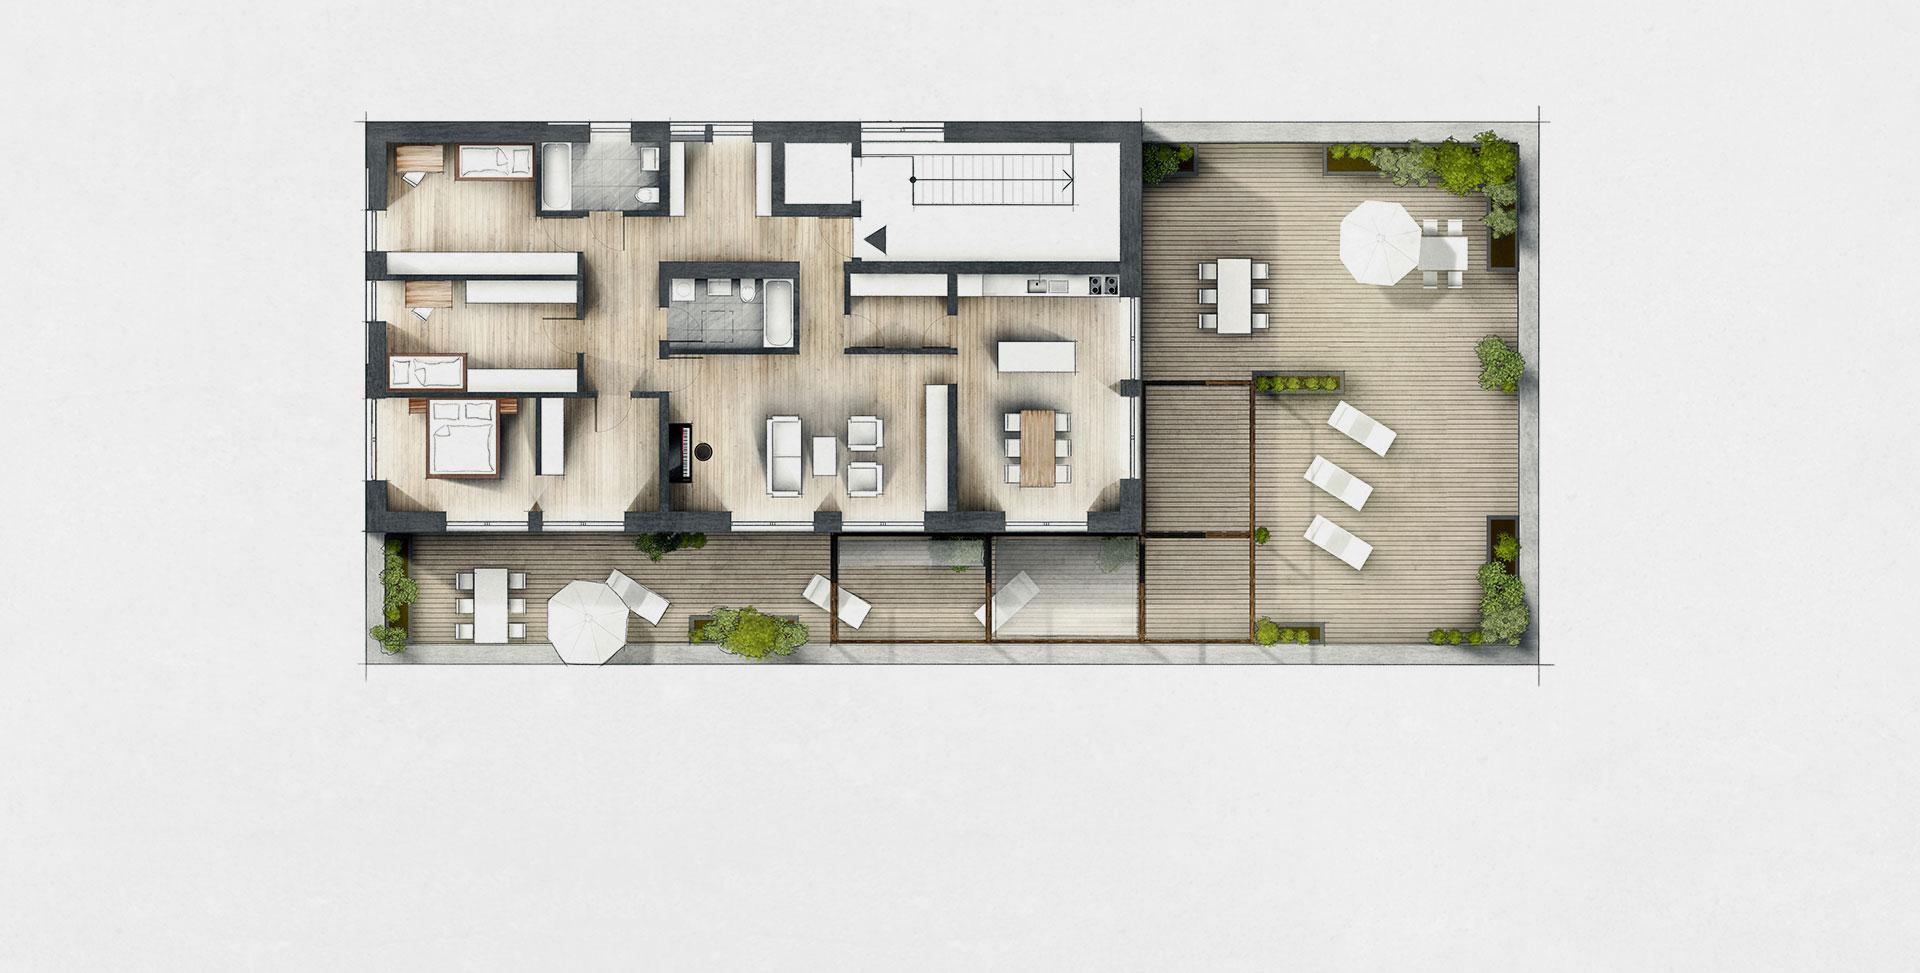 Grundrissoptimierung 360 Grad Panorama Leipzig Innenarchitek